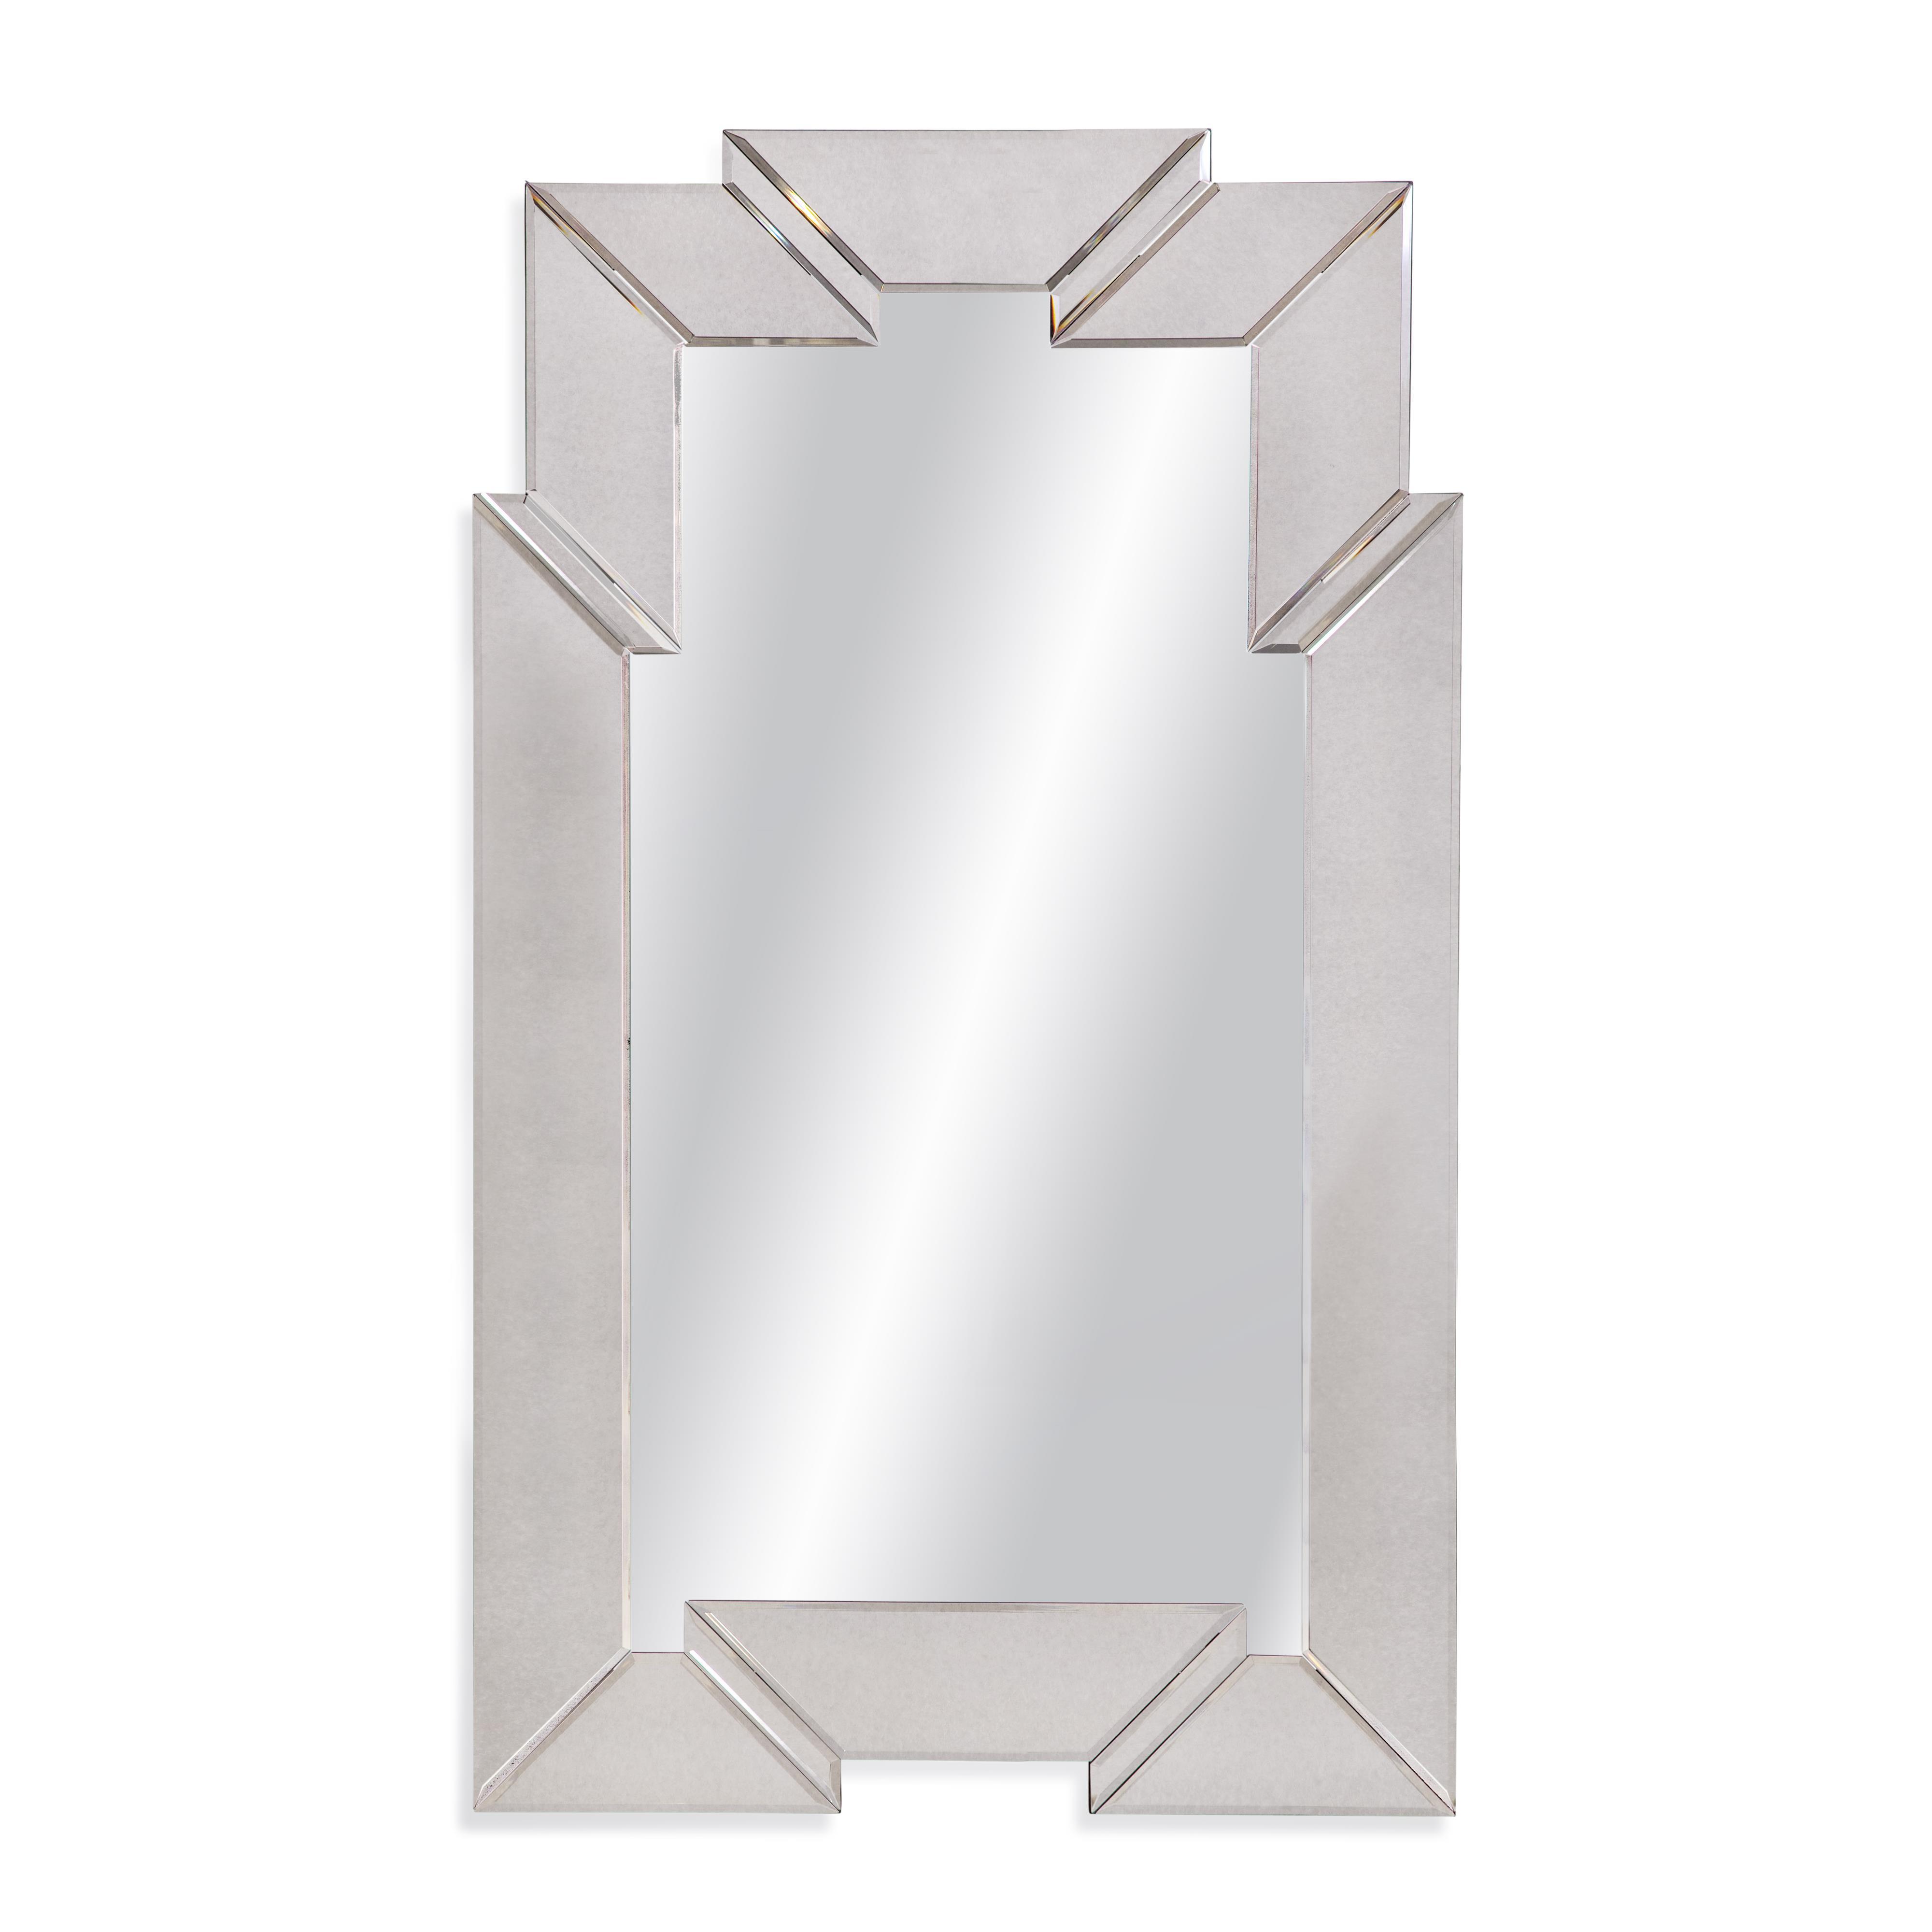 McCall Wall Mirror